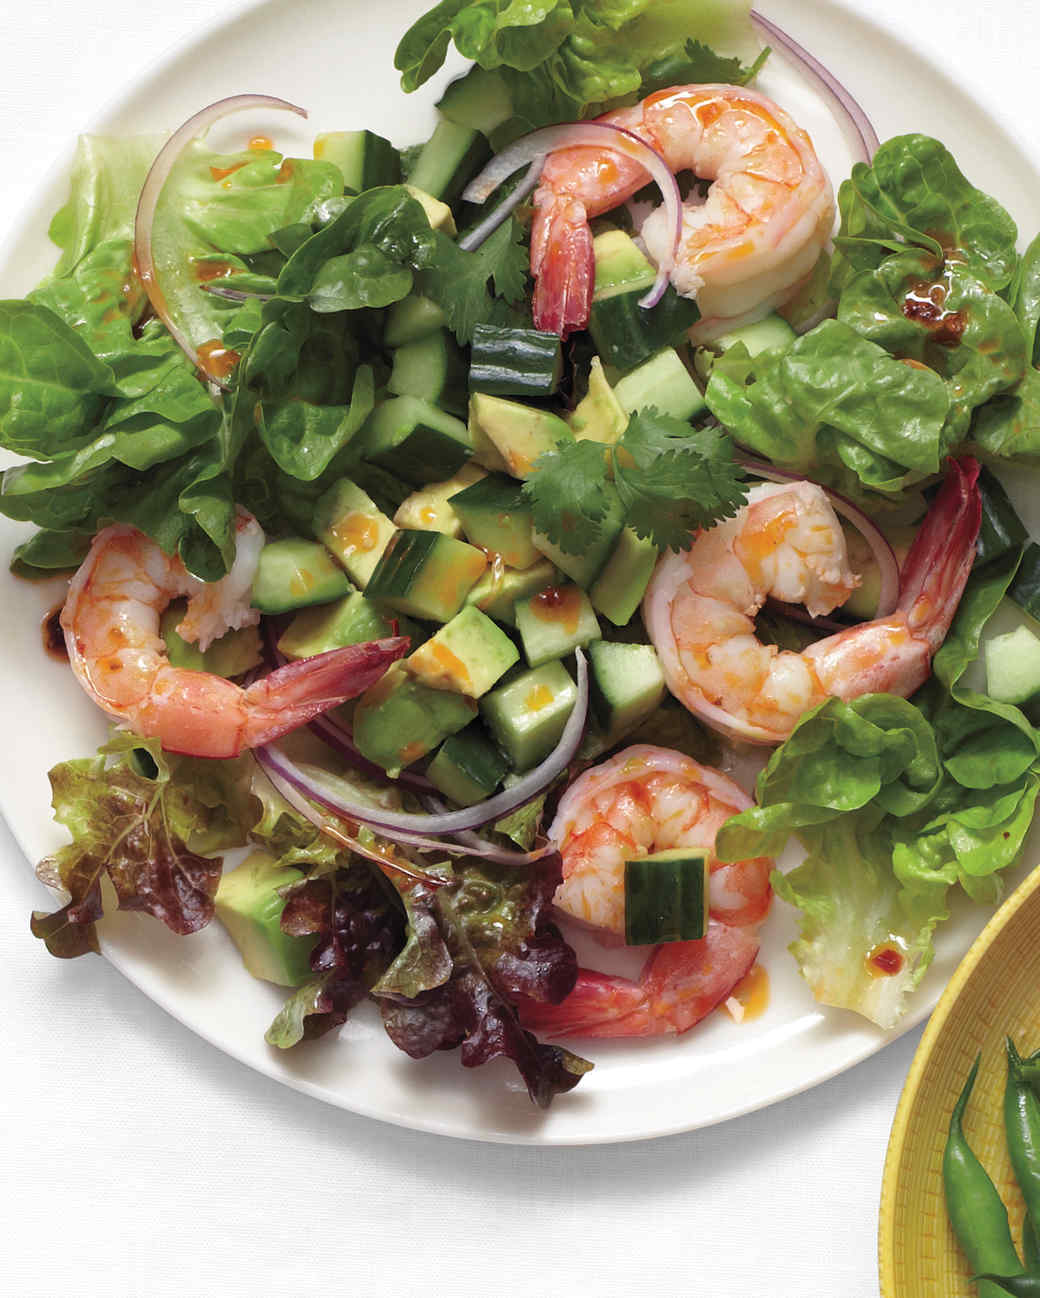 southwestern-salad-with-shrimp-d107287-0715.jpg